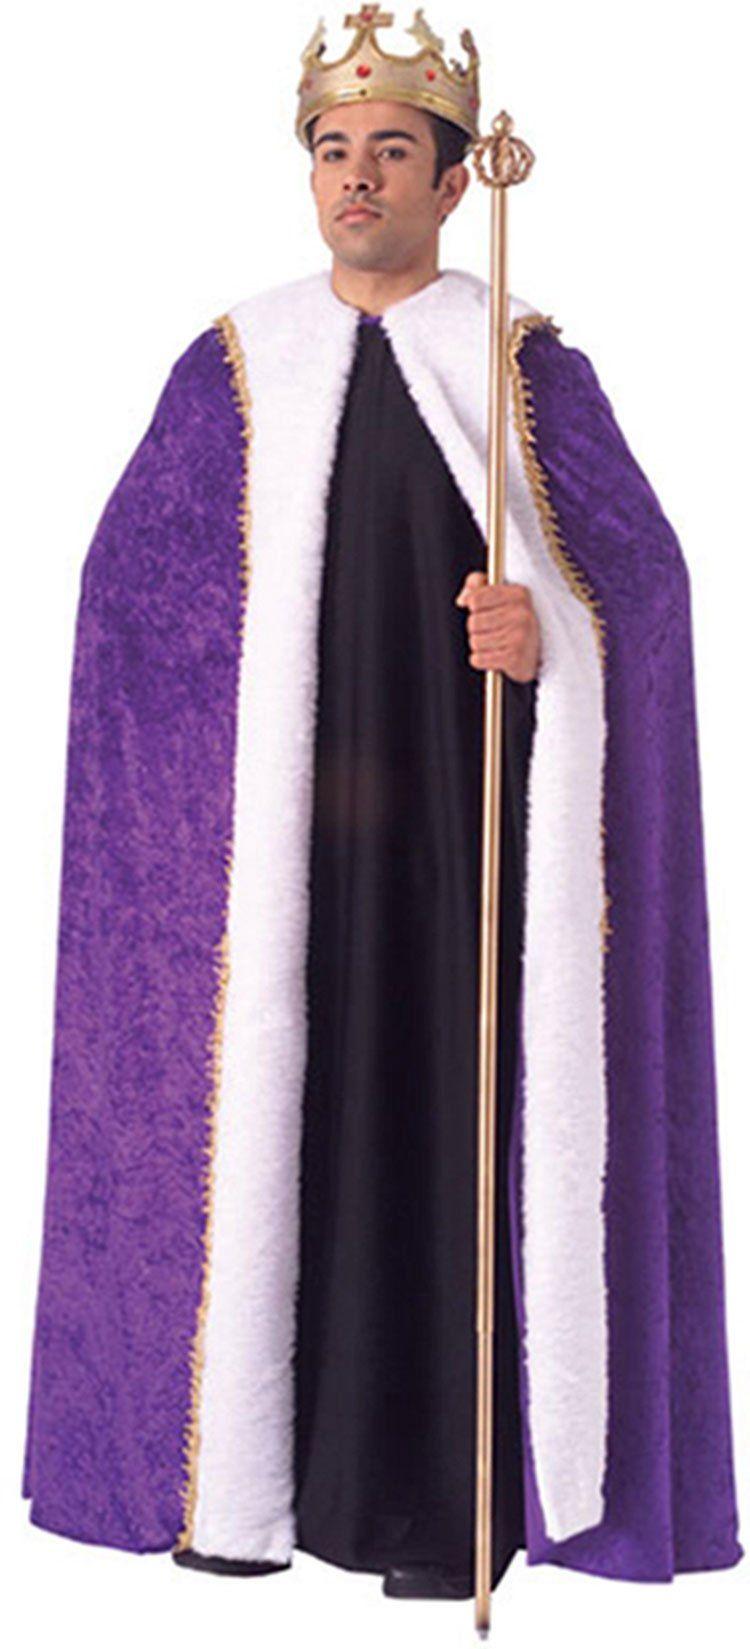 Men King Cloak Cape Robe Renaissance Medieval Purple Burgundy Costume Halloween